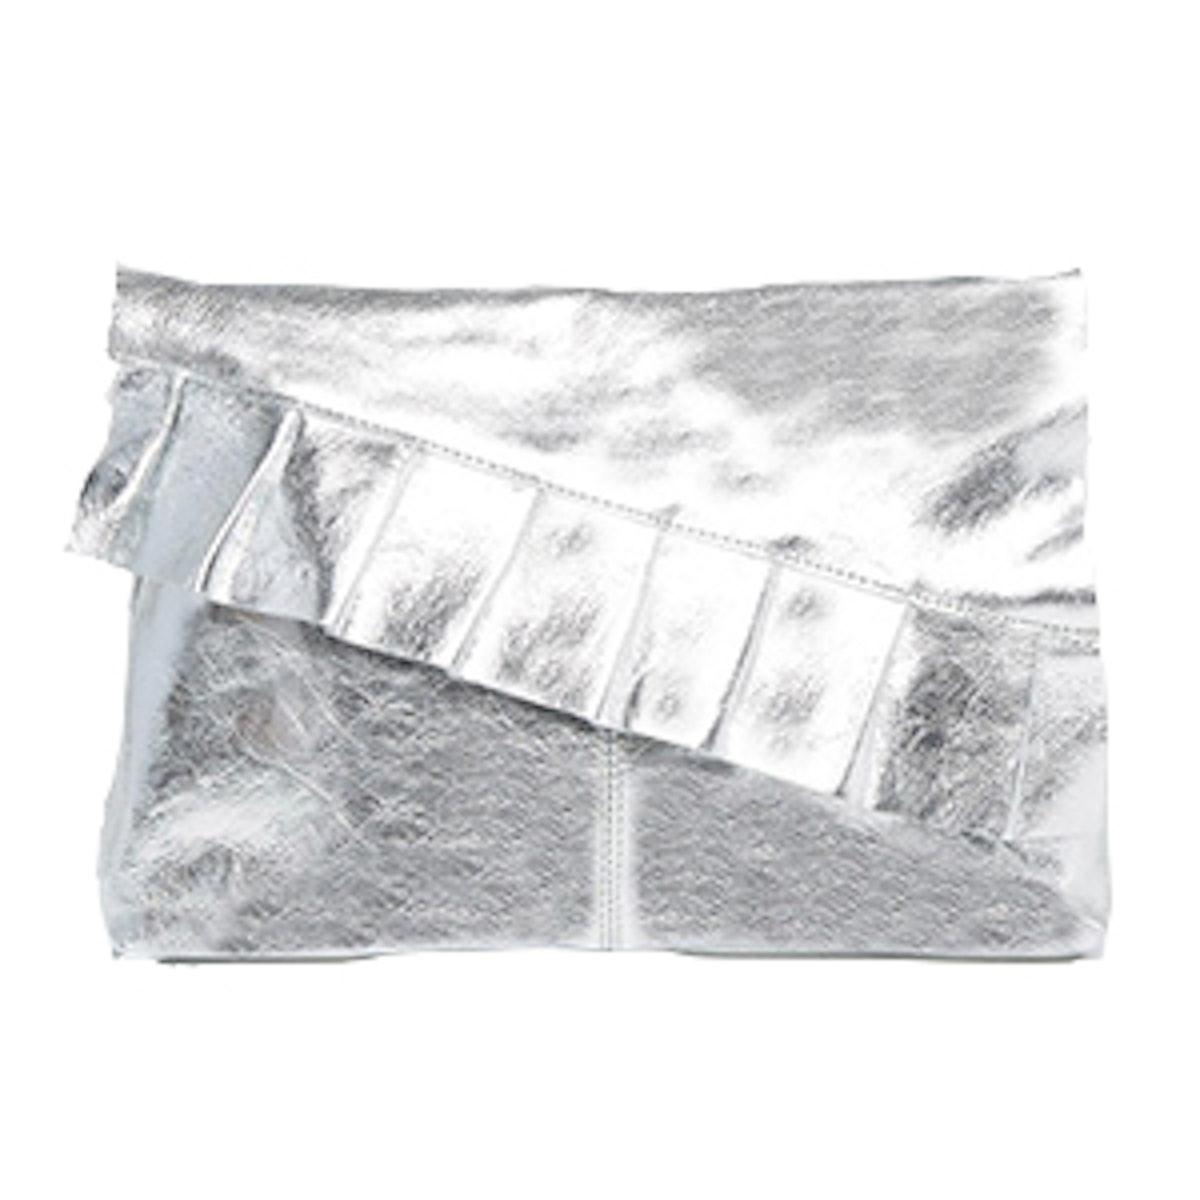 Metallic Leather Ruffle Clutch Bag